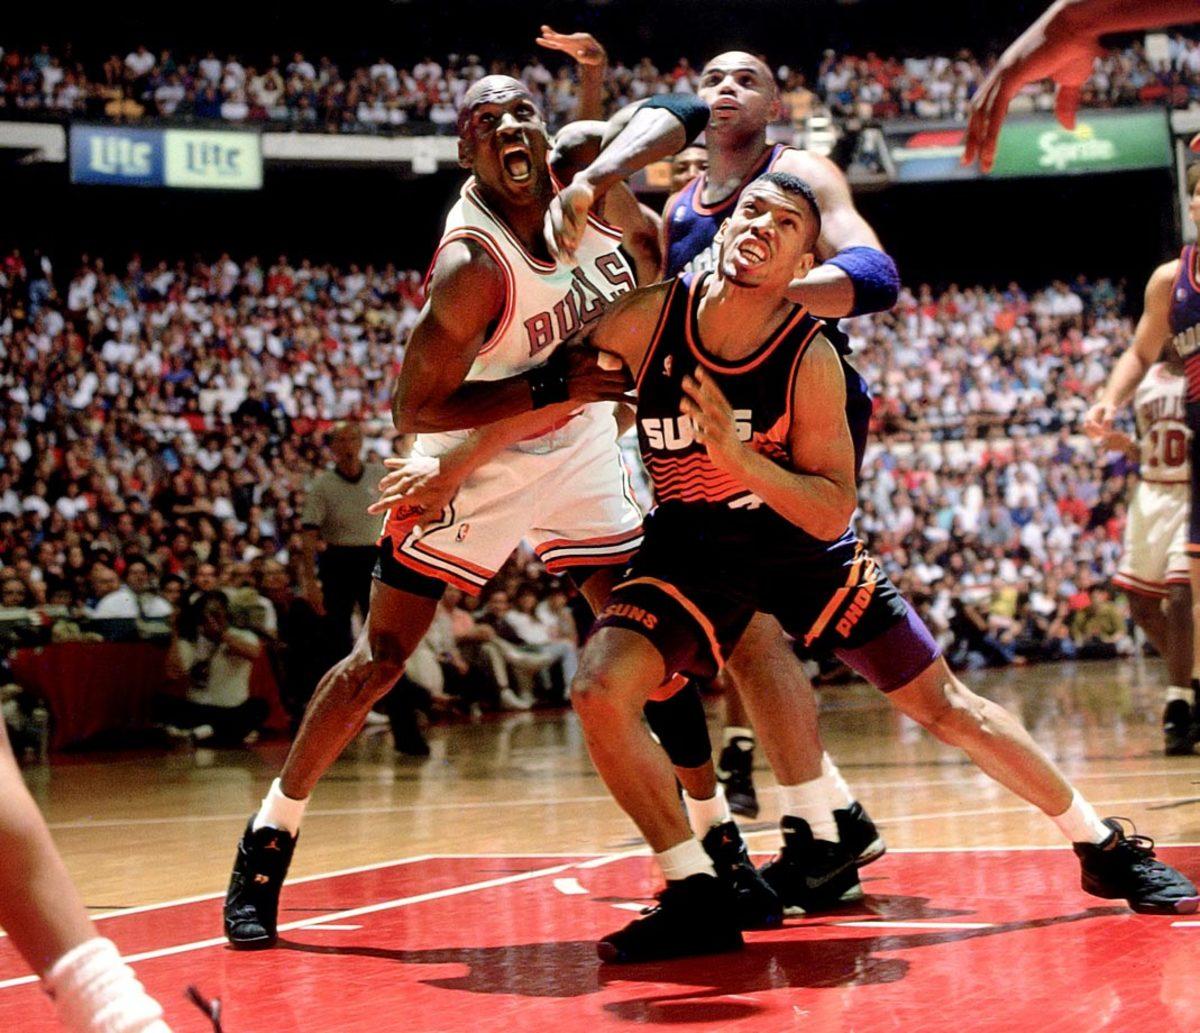 1993-0613-Michael-Jordan-Kevin-Johnson-Charles-Barkley-005102070.jpg